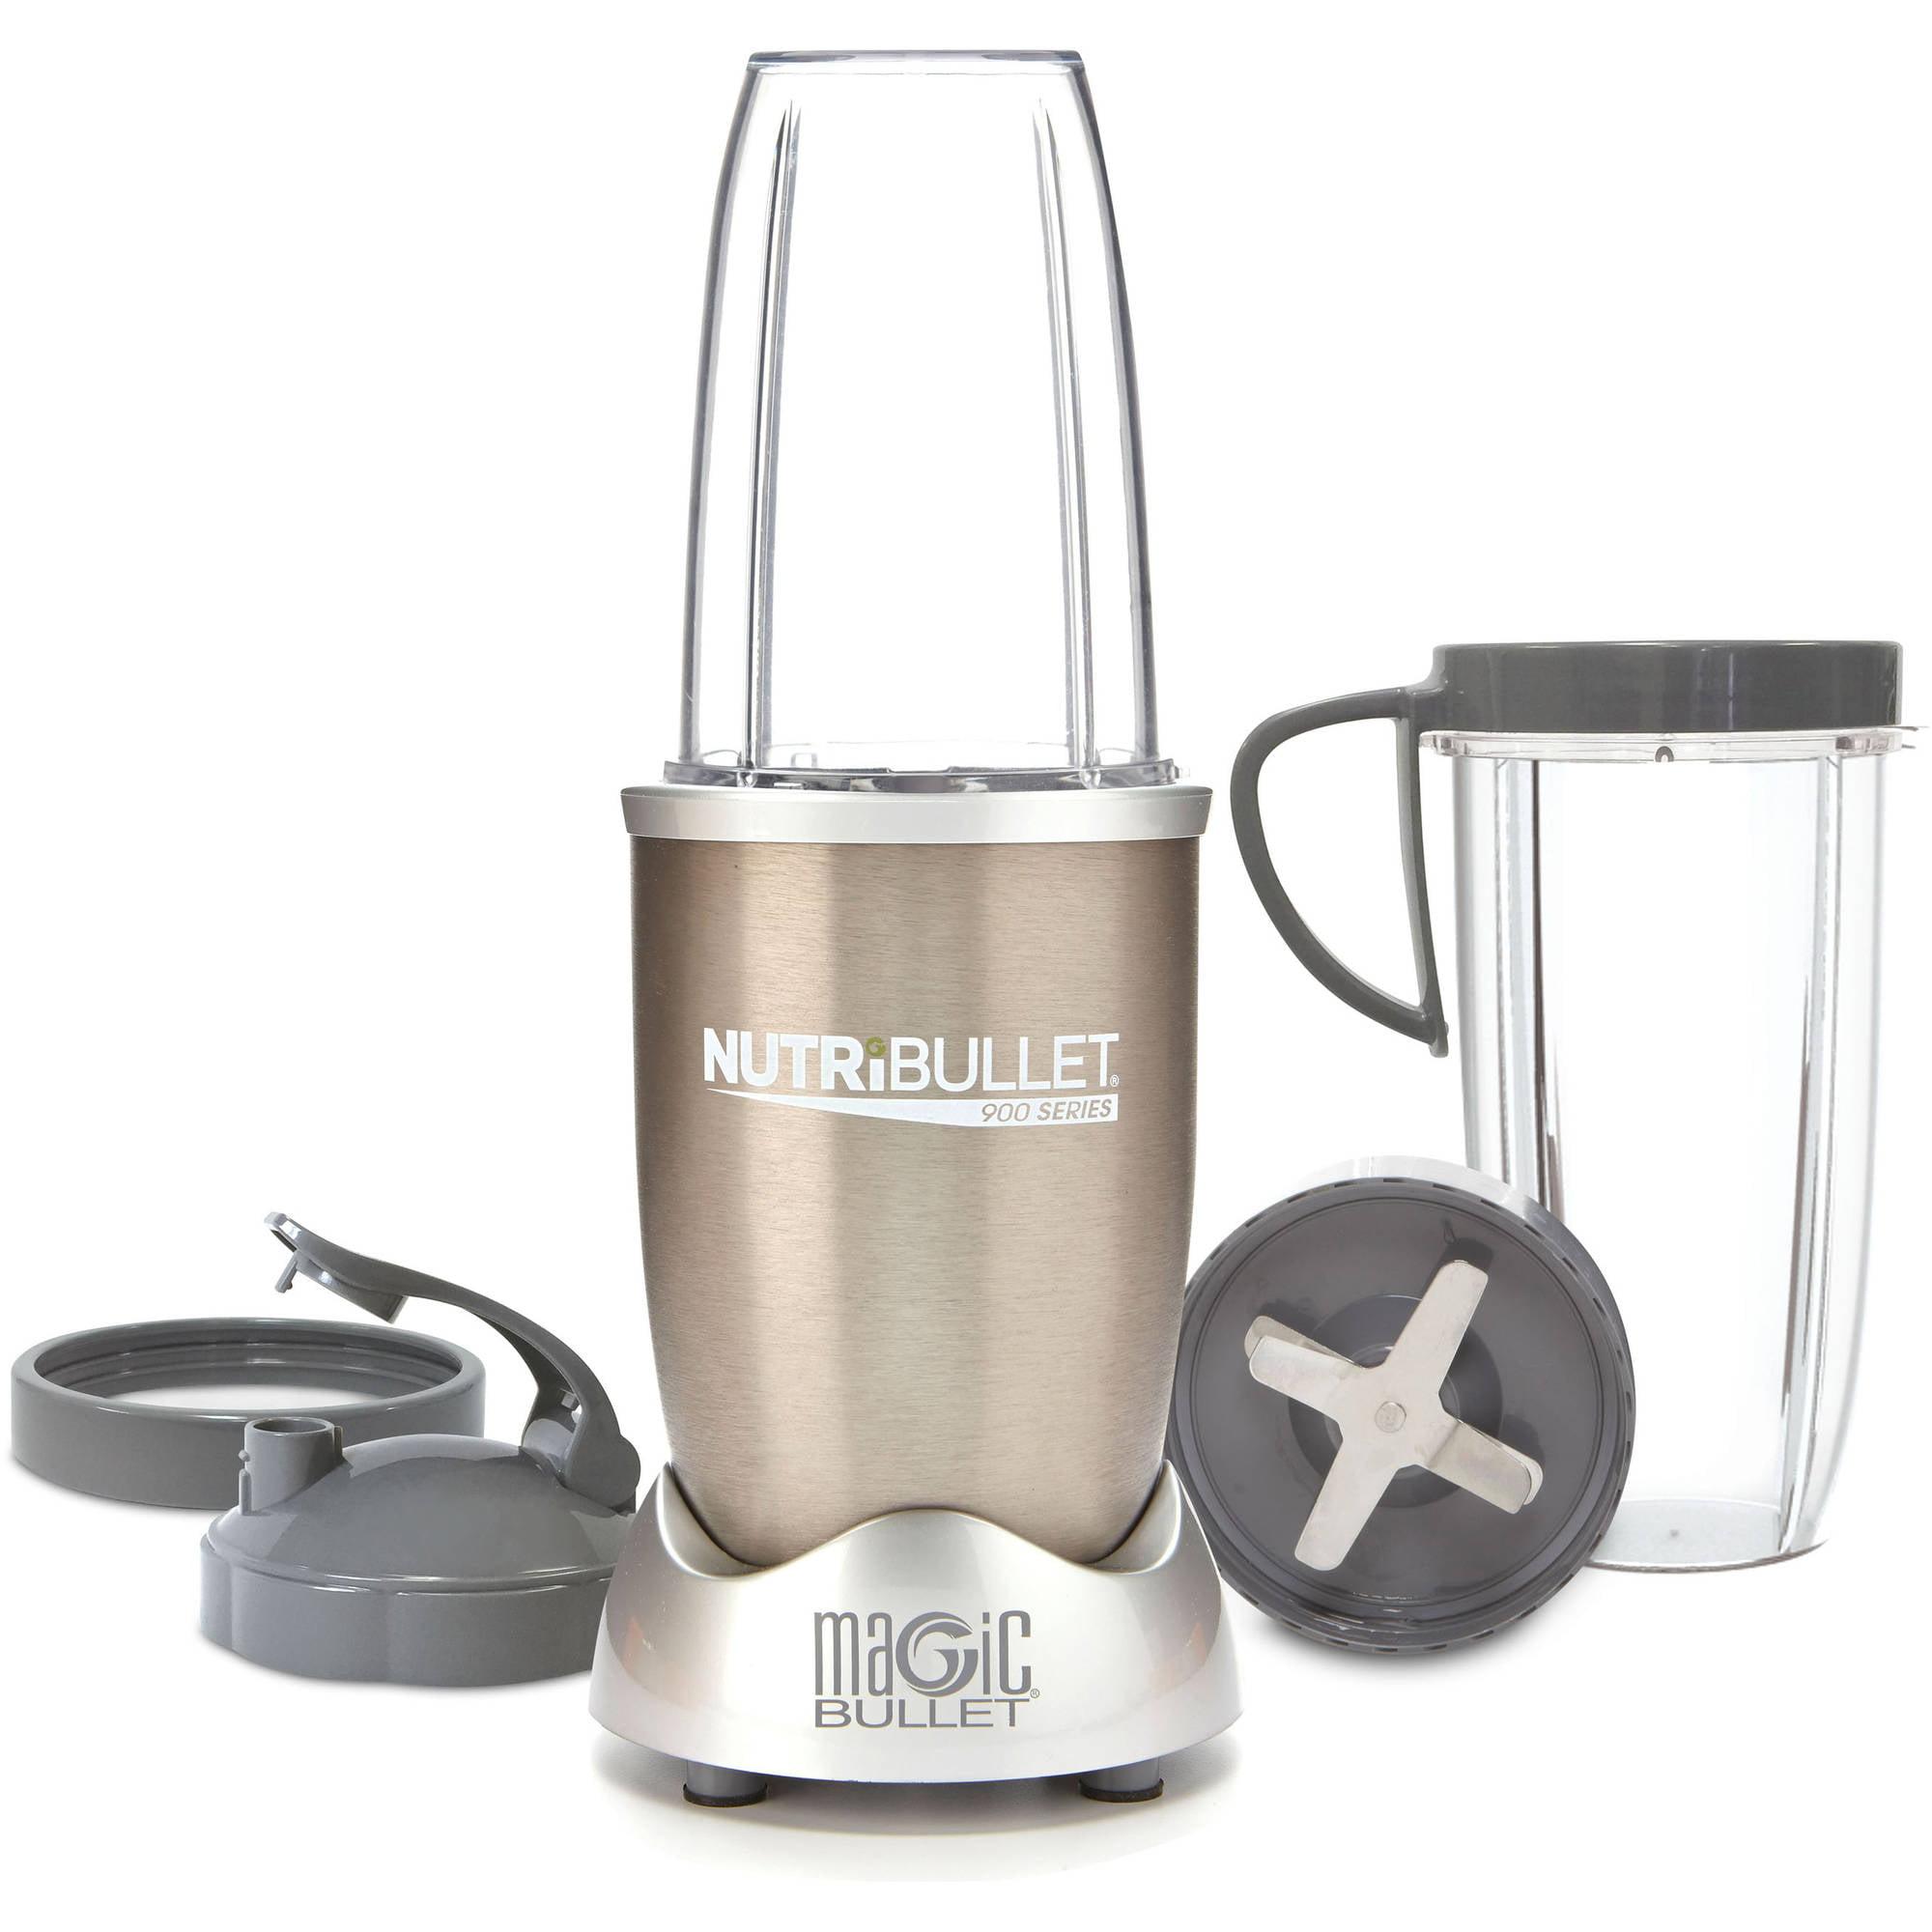 NutriBullet Pro 900 Kitchen Blender/Mixer